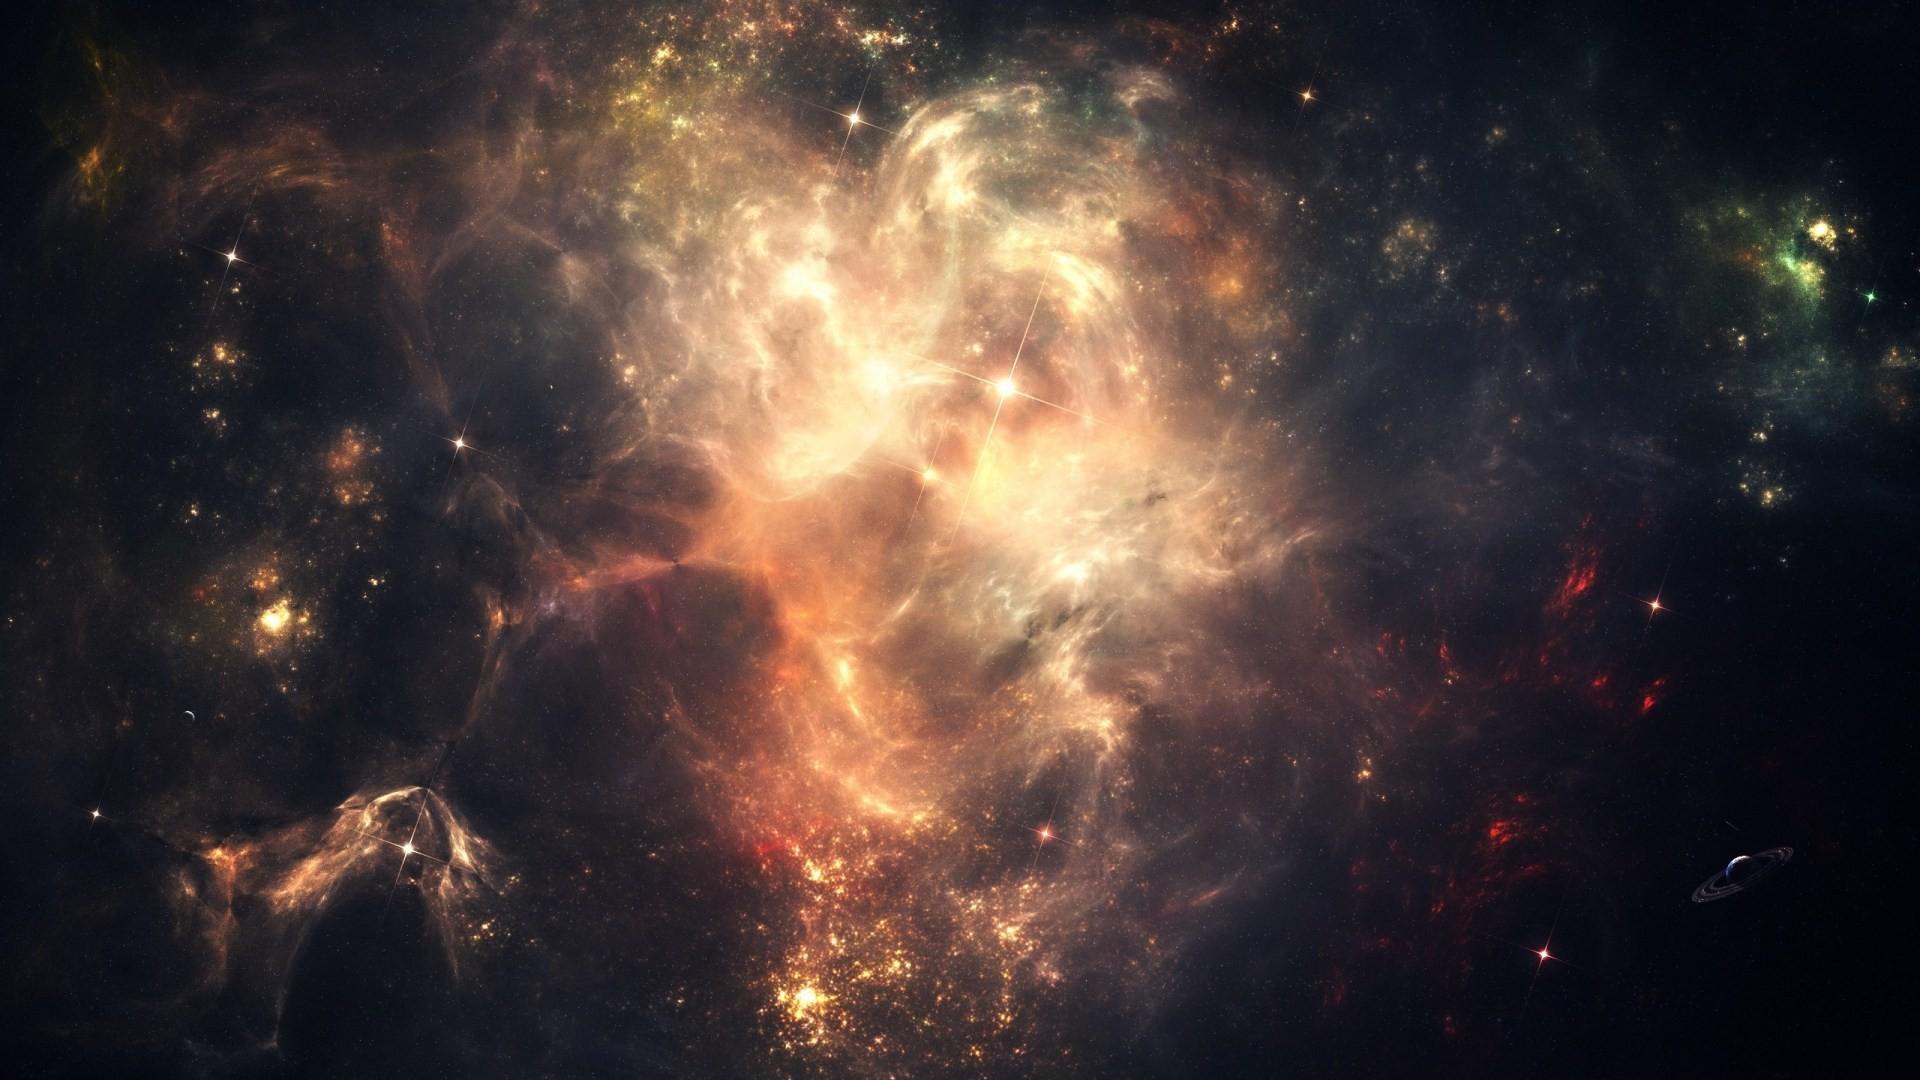 Download HD Space Galaxy Dark Cluster Clouds Lights Shadows Wallpaper